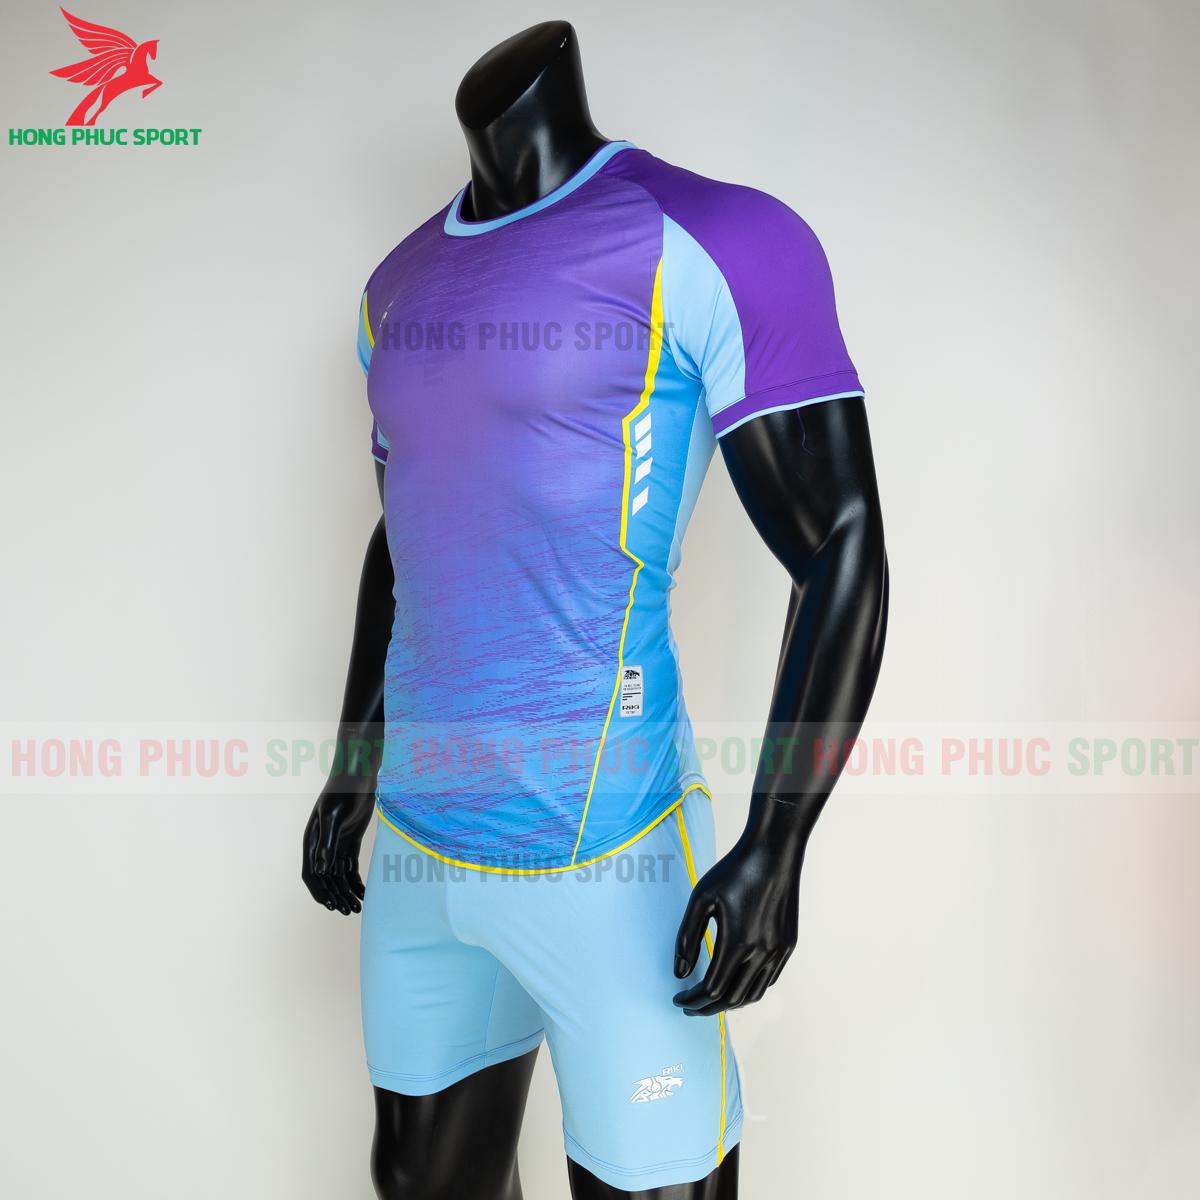 https://cdn.hongphucsport.com/unsafe/s4.shopbay.vn/files/285/ao-bong-da-khong-logo-riki-grambor-mau-xanh-da-4-60506185075cb.png